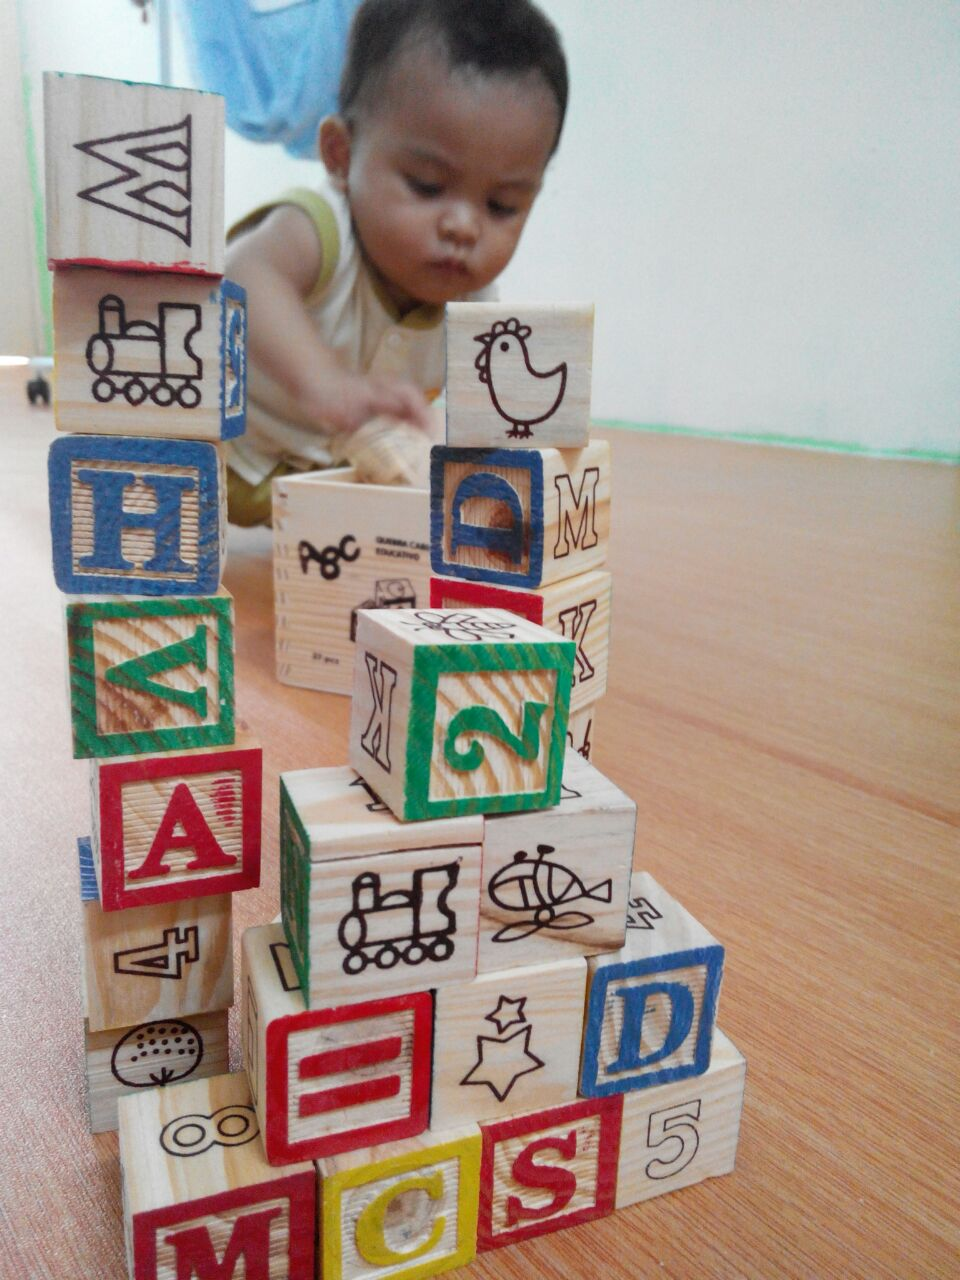 mainan berpelajaran untuk anak 1 tahun